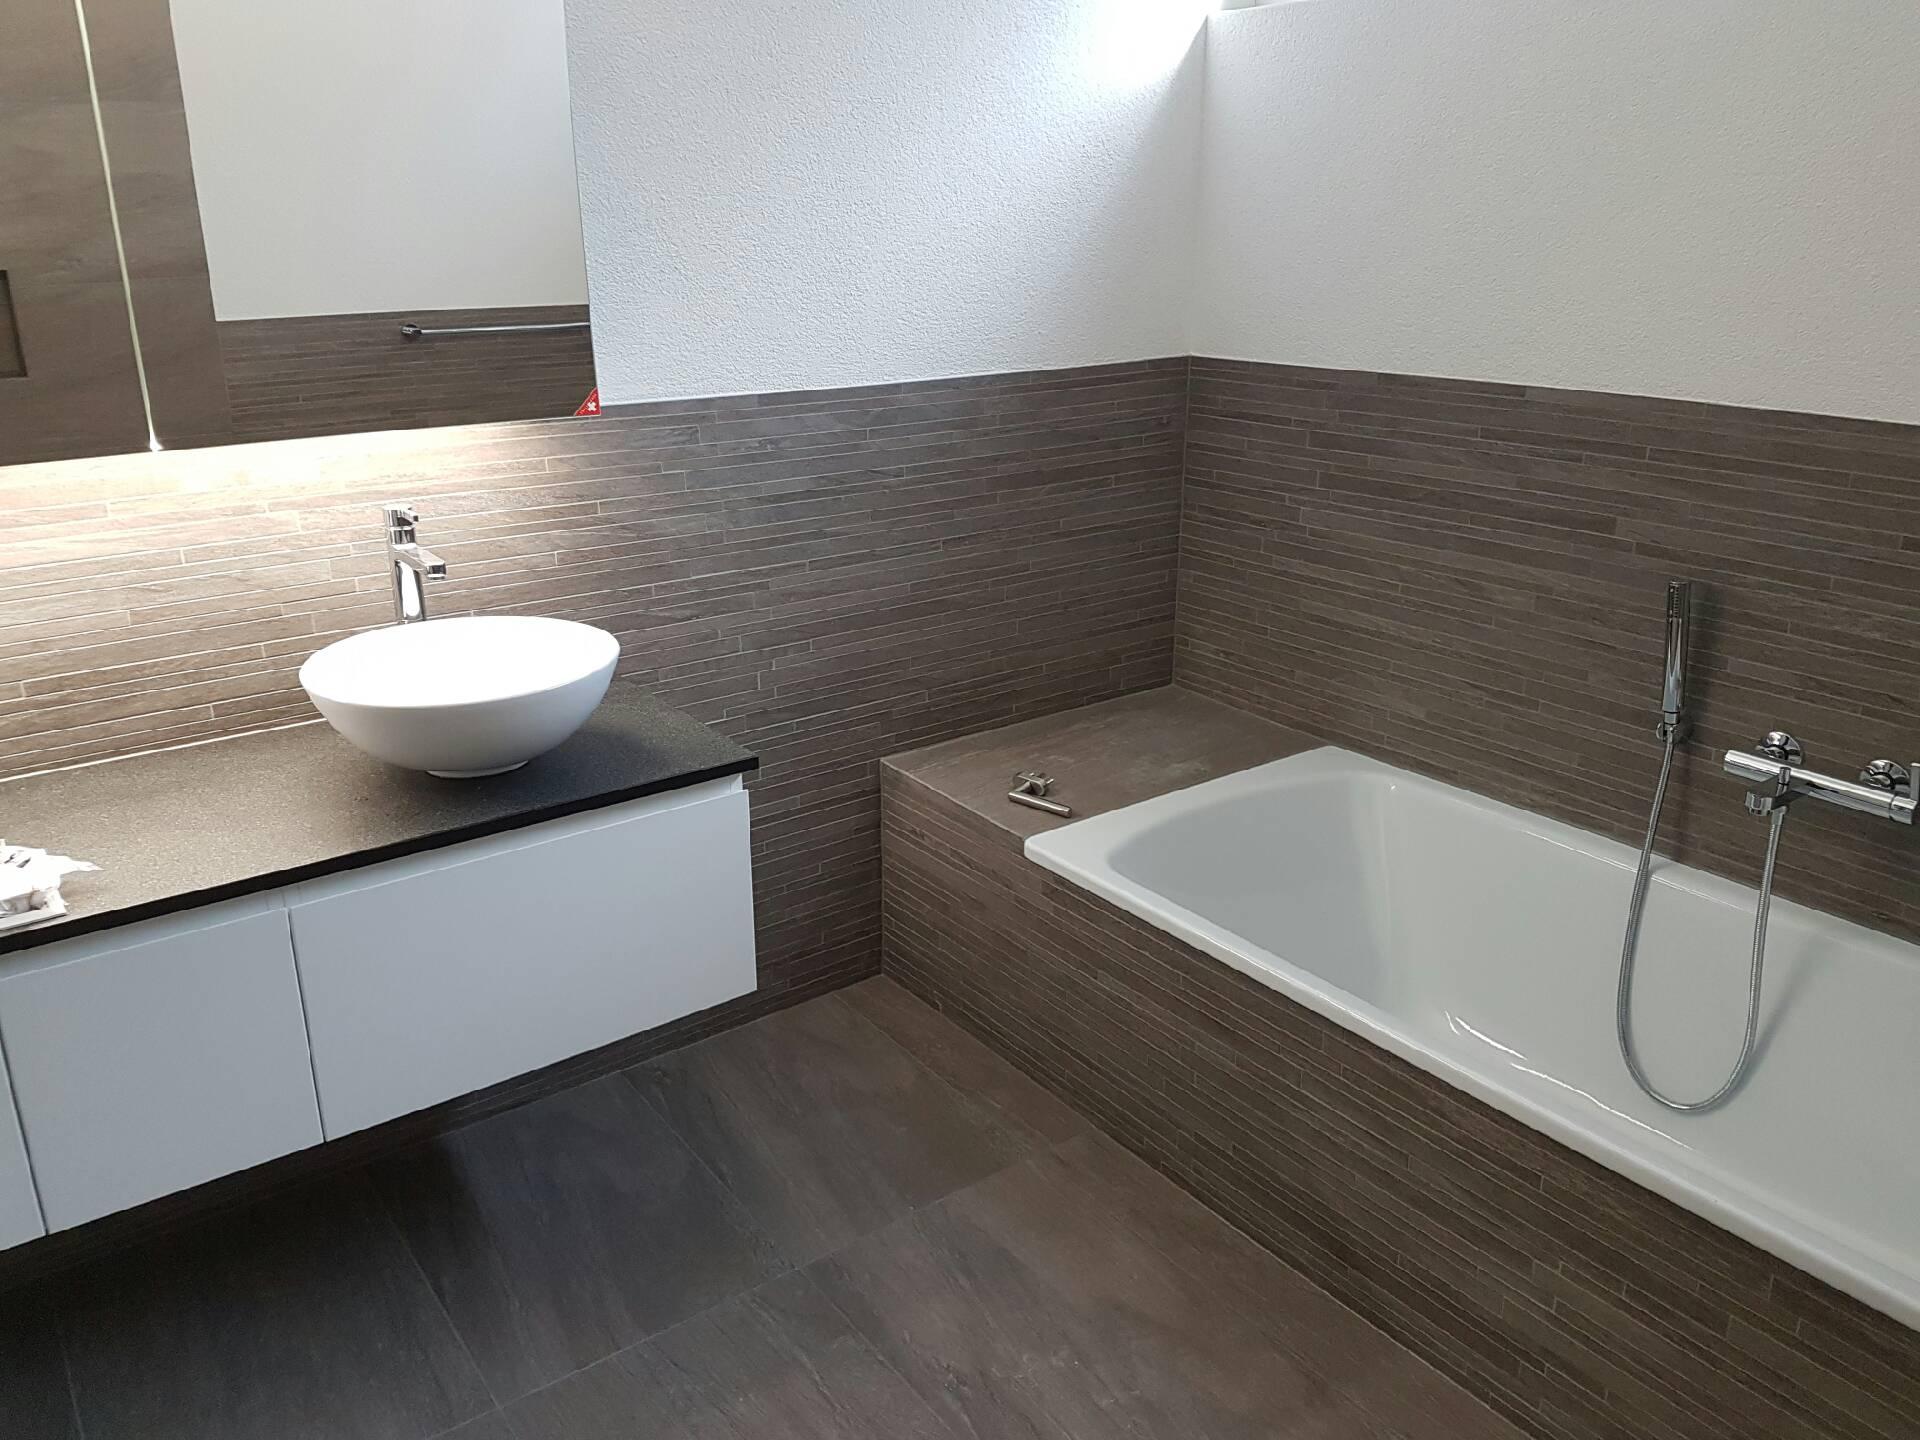 keramikplatten. Black Bedroom Furniture Sets. Home Design Ideas